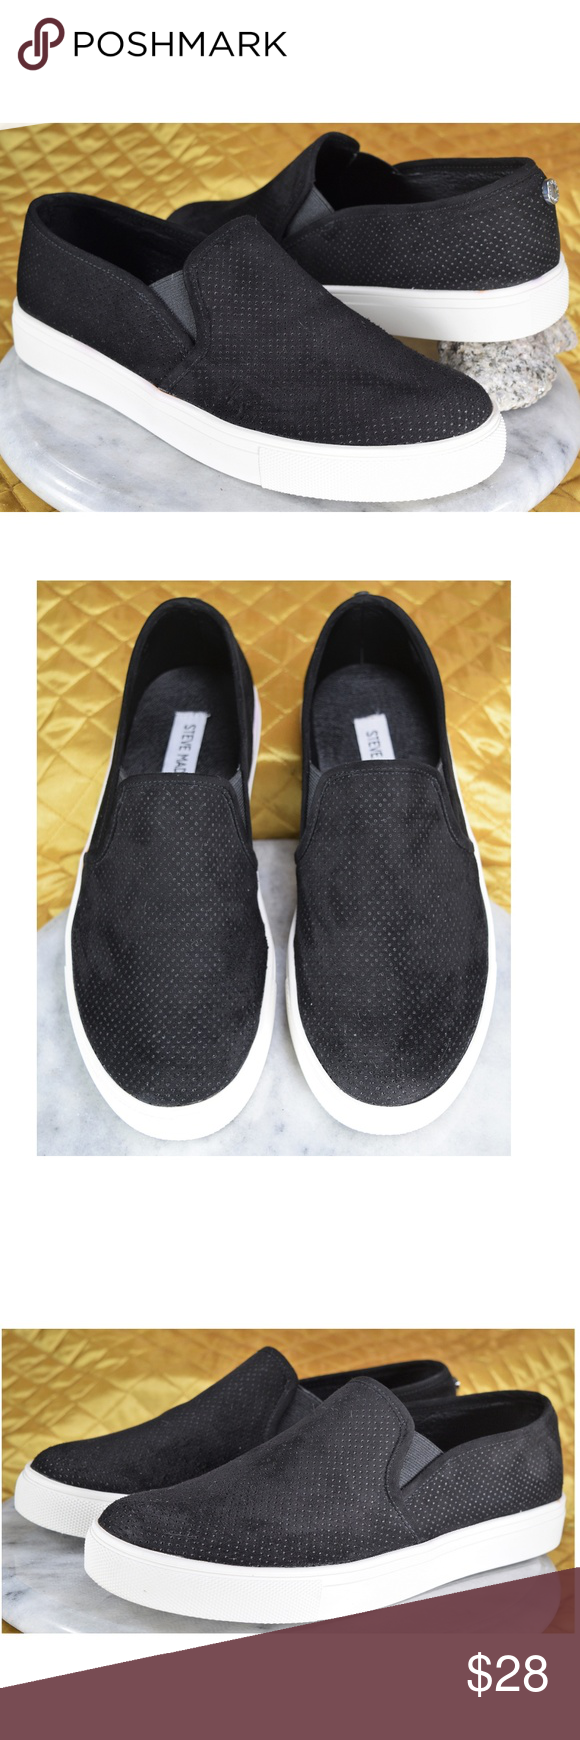 Black Sneakers ZARAYY Sz 8.5